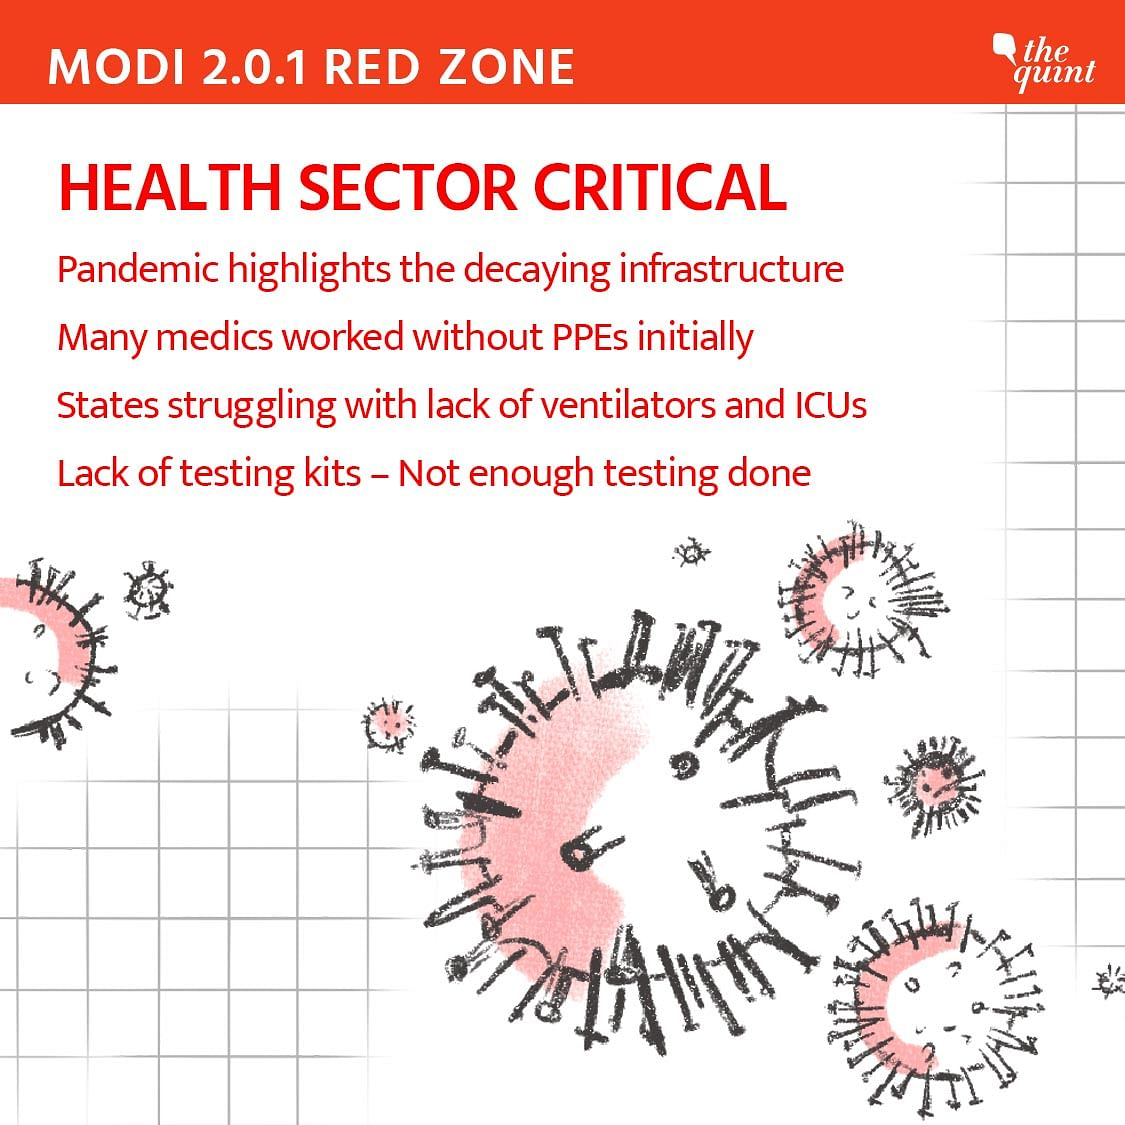 Health sector critical.